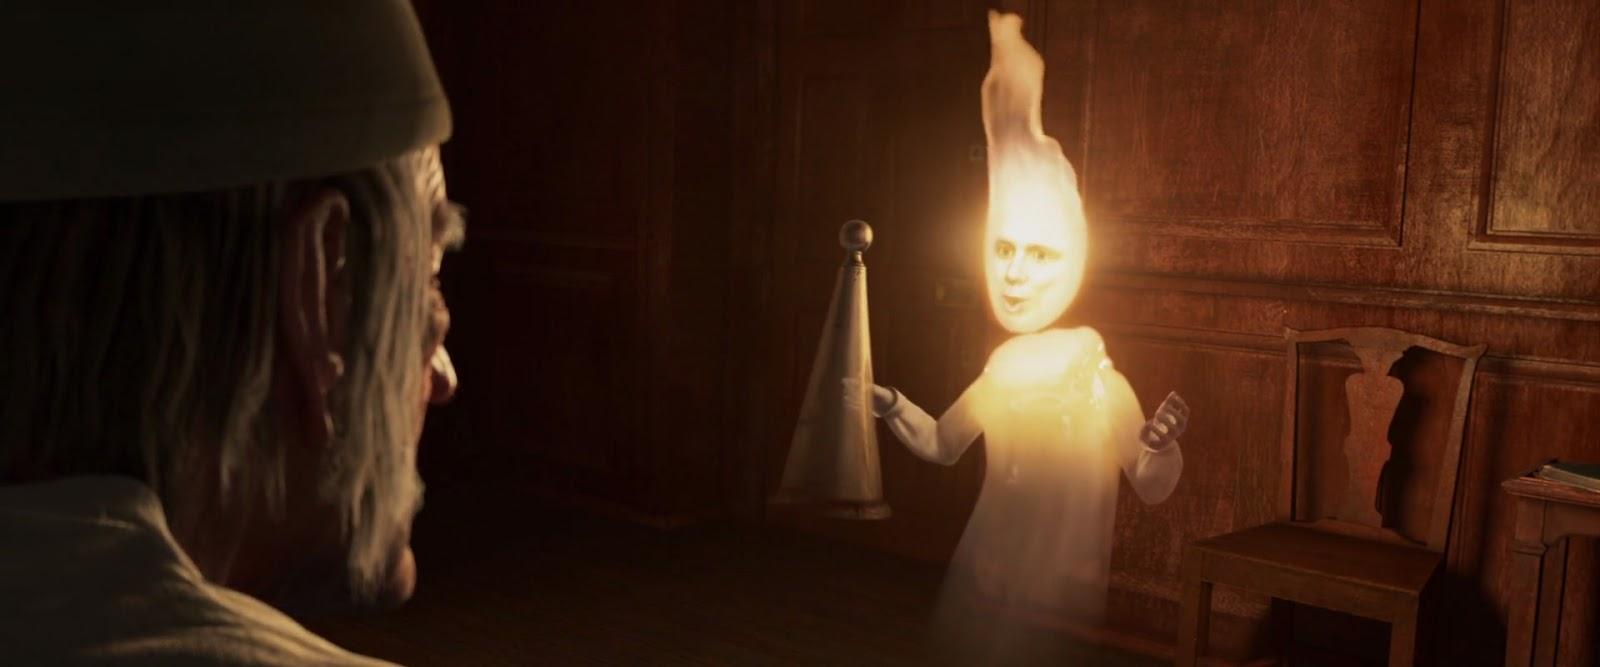 A Christmas Carol Spirits.Erin S Blog 3 Ghosts From A Christmas Carol